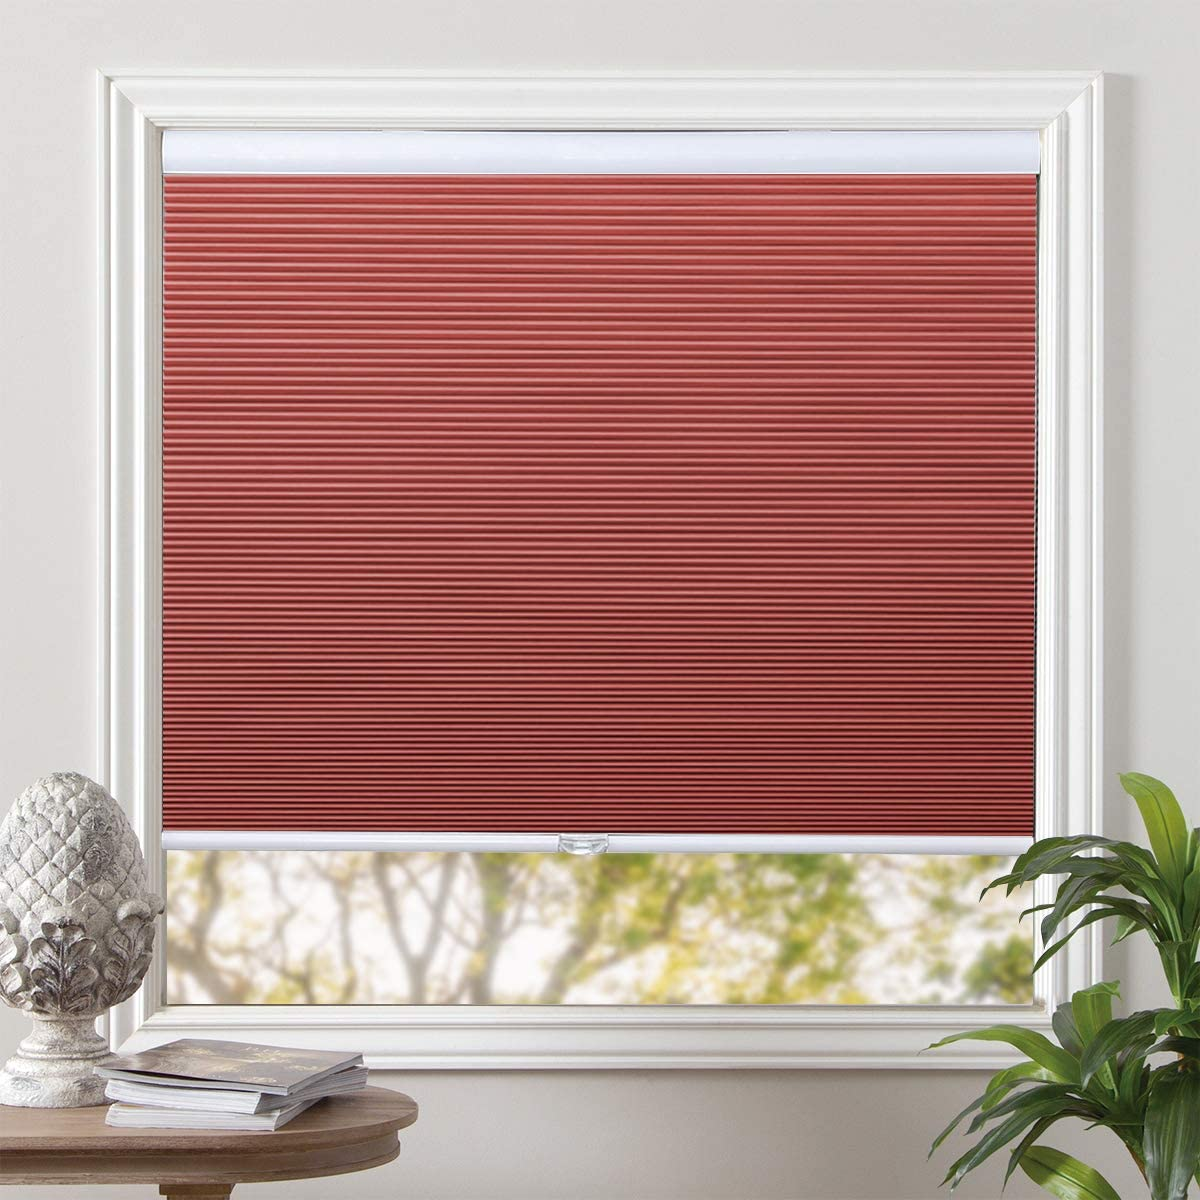 Grandekor Blackout Max 55% OFF Shades Cordless Dedication Fabric Blinds Cellular